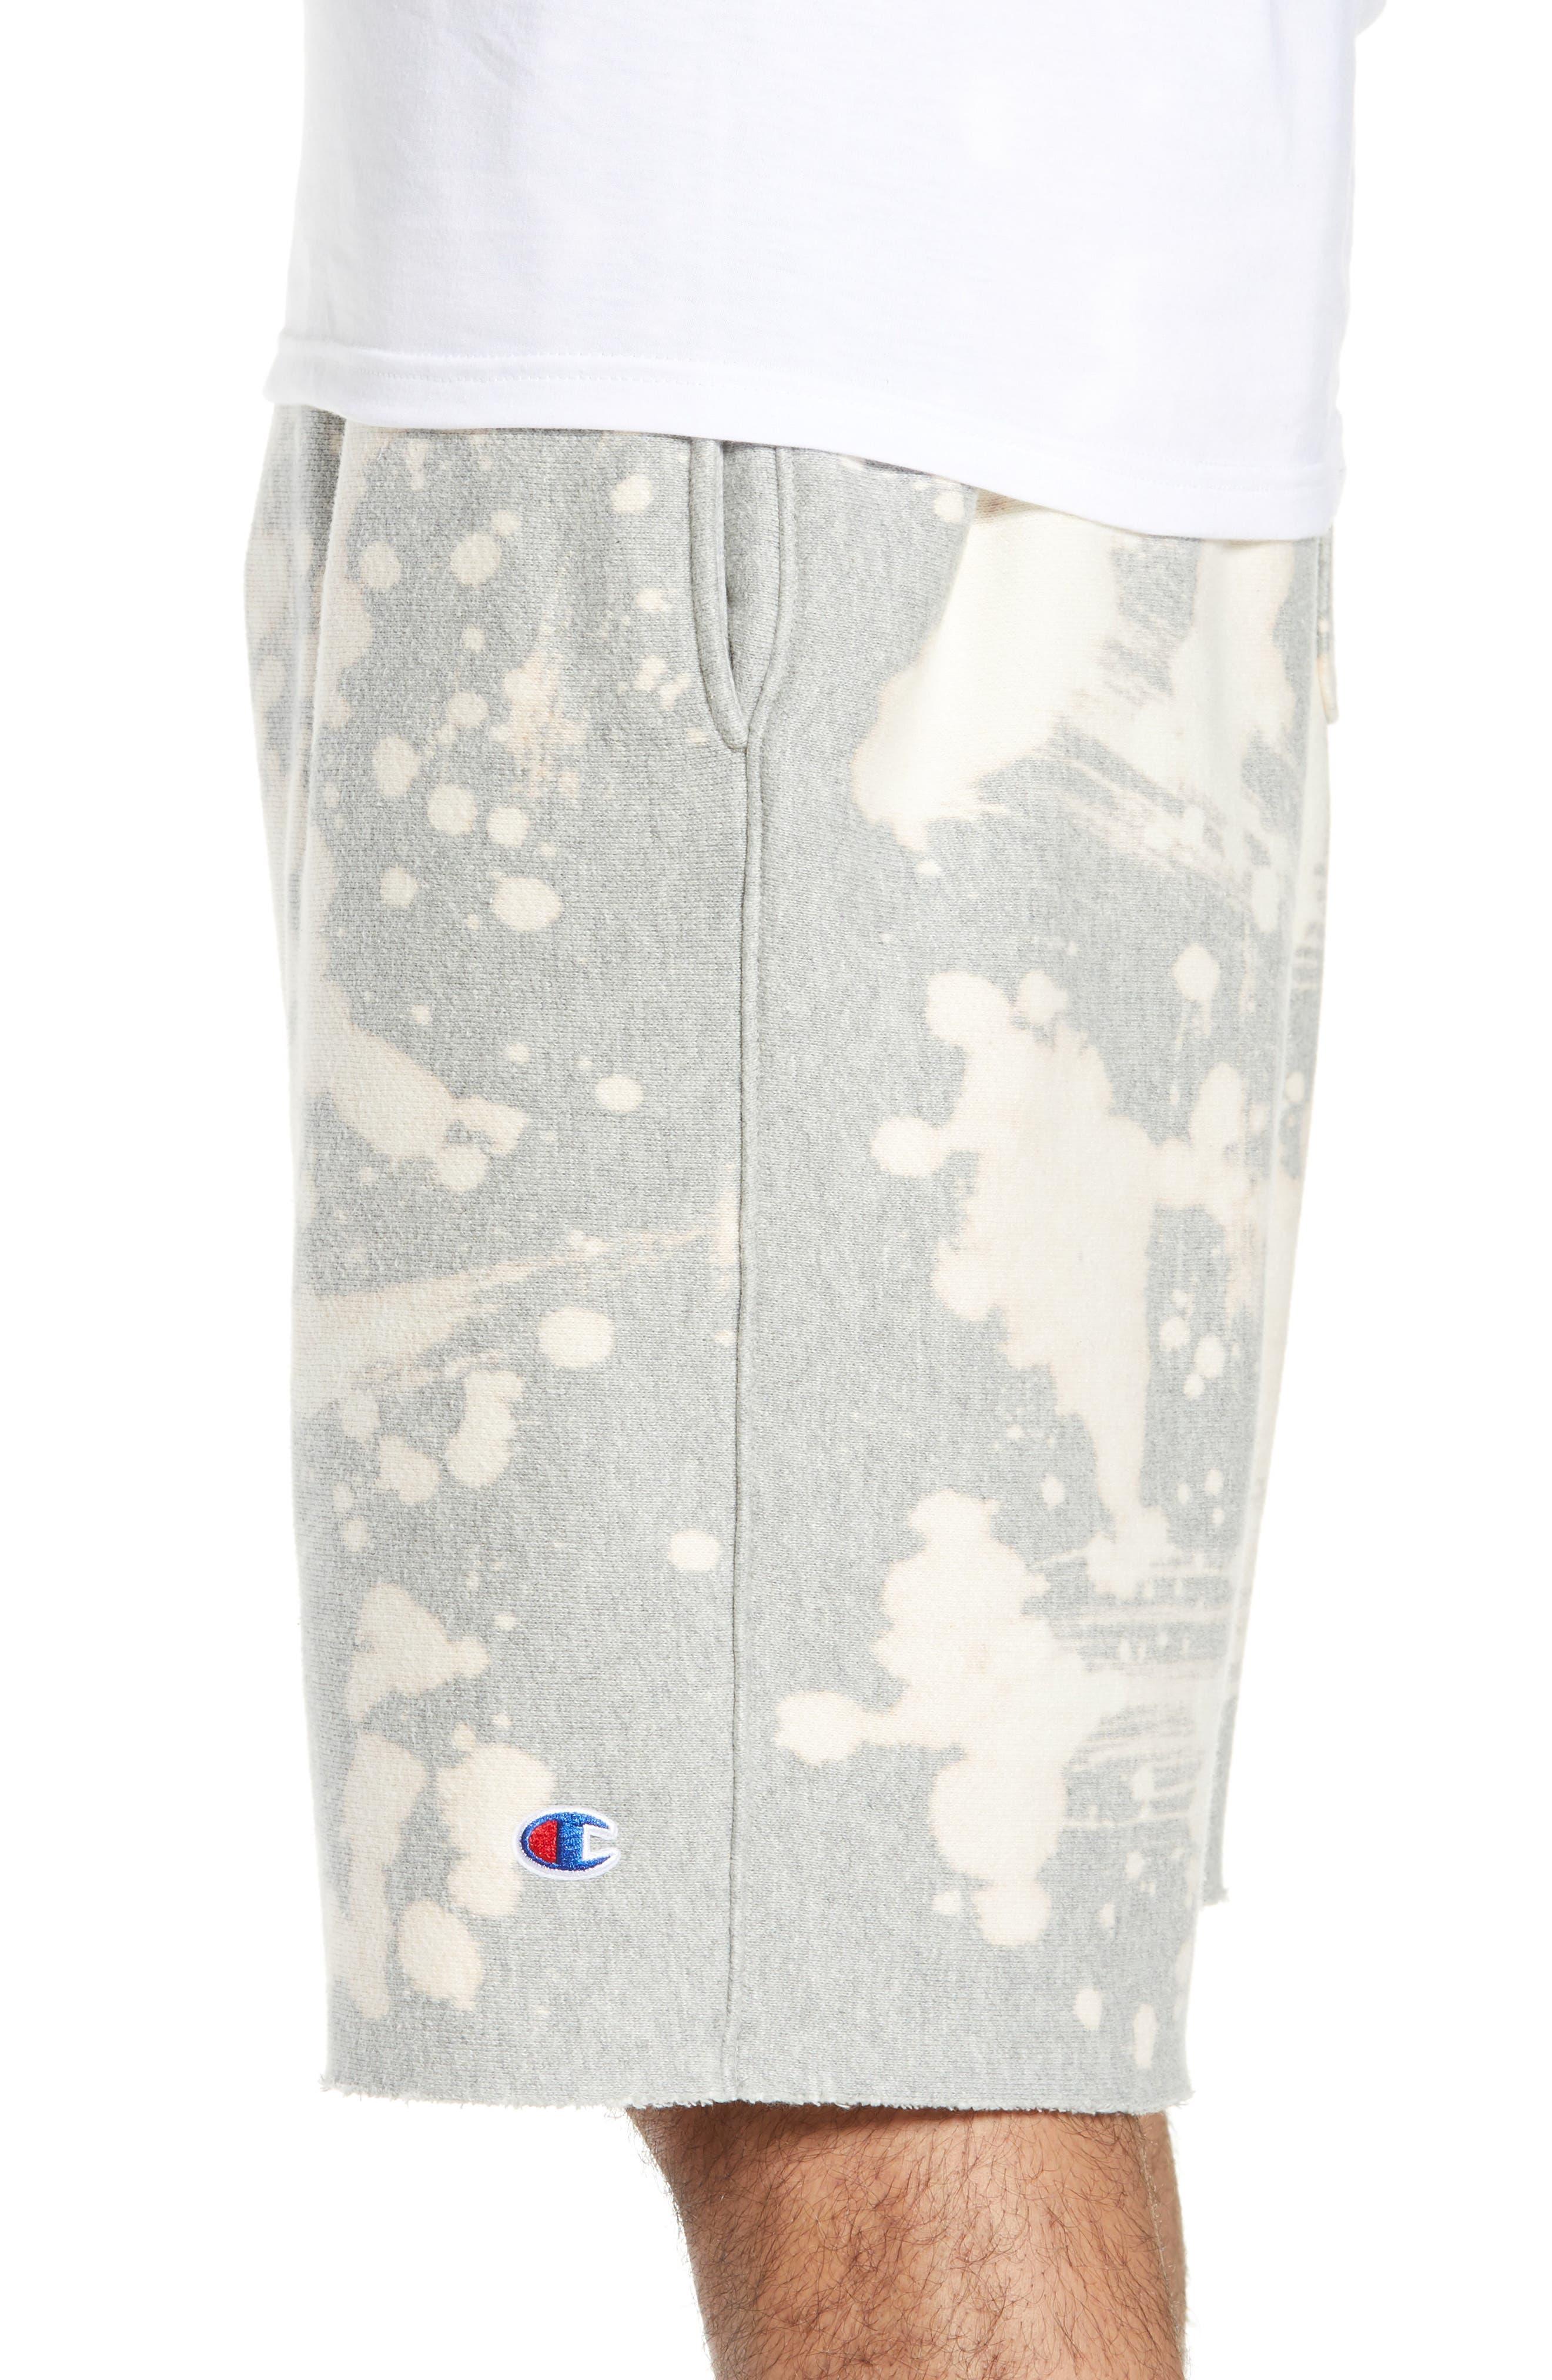 CHAMPION, Bleach Splatter Crewneck Athletic Shorts, Alternate thumbnail 4, color, OXFORD GREY